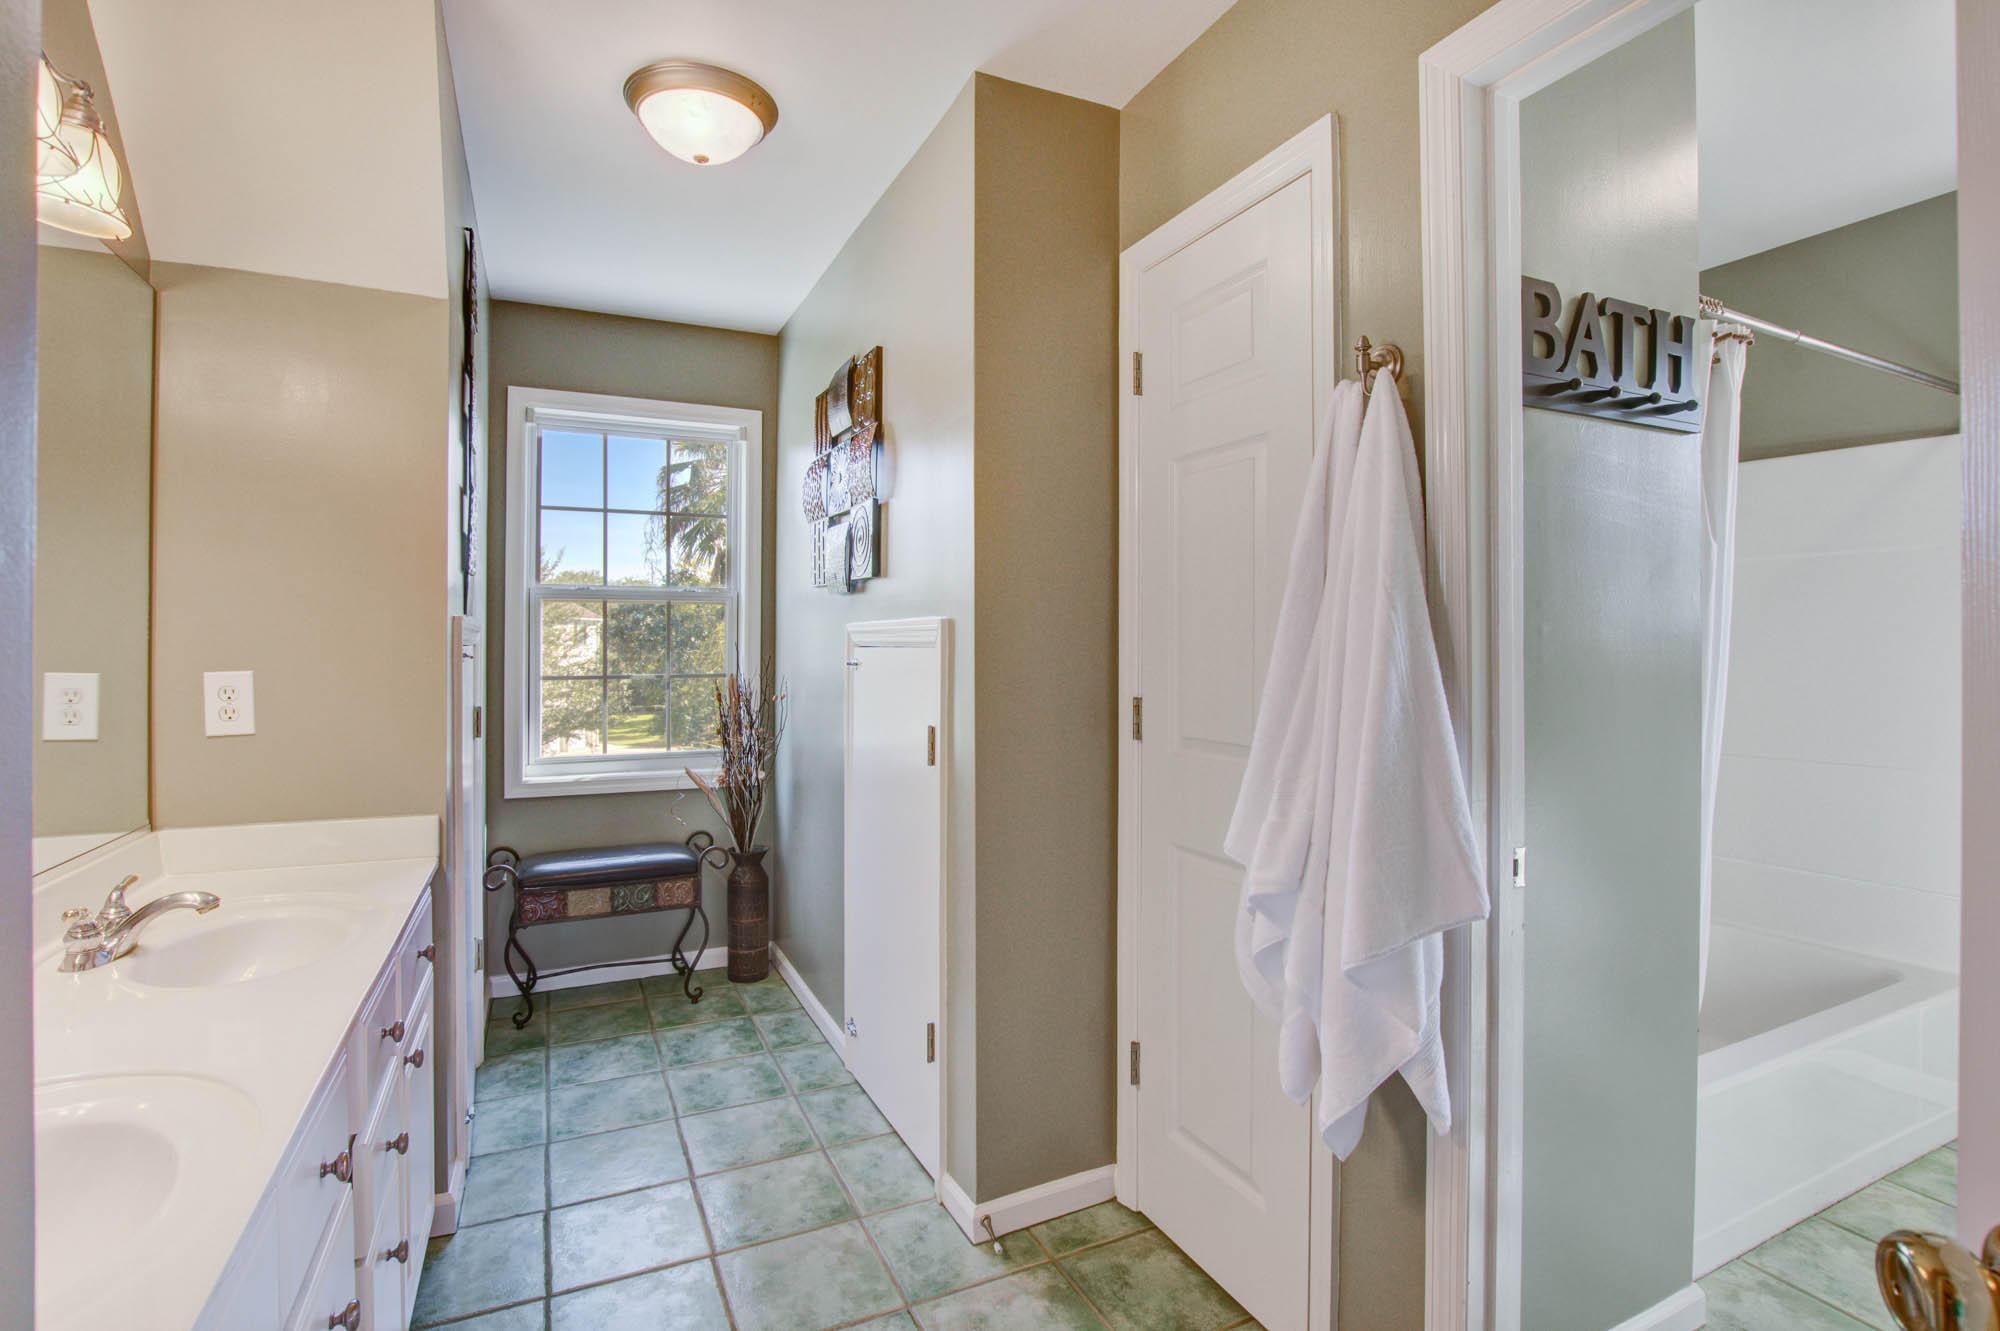 St Thomas Point Homes For Sale - 307 Jamesbury, Charleston, SC - 16